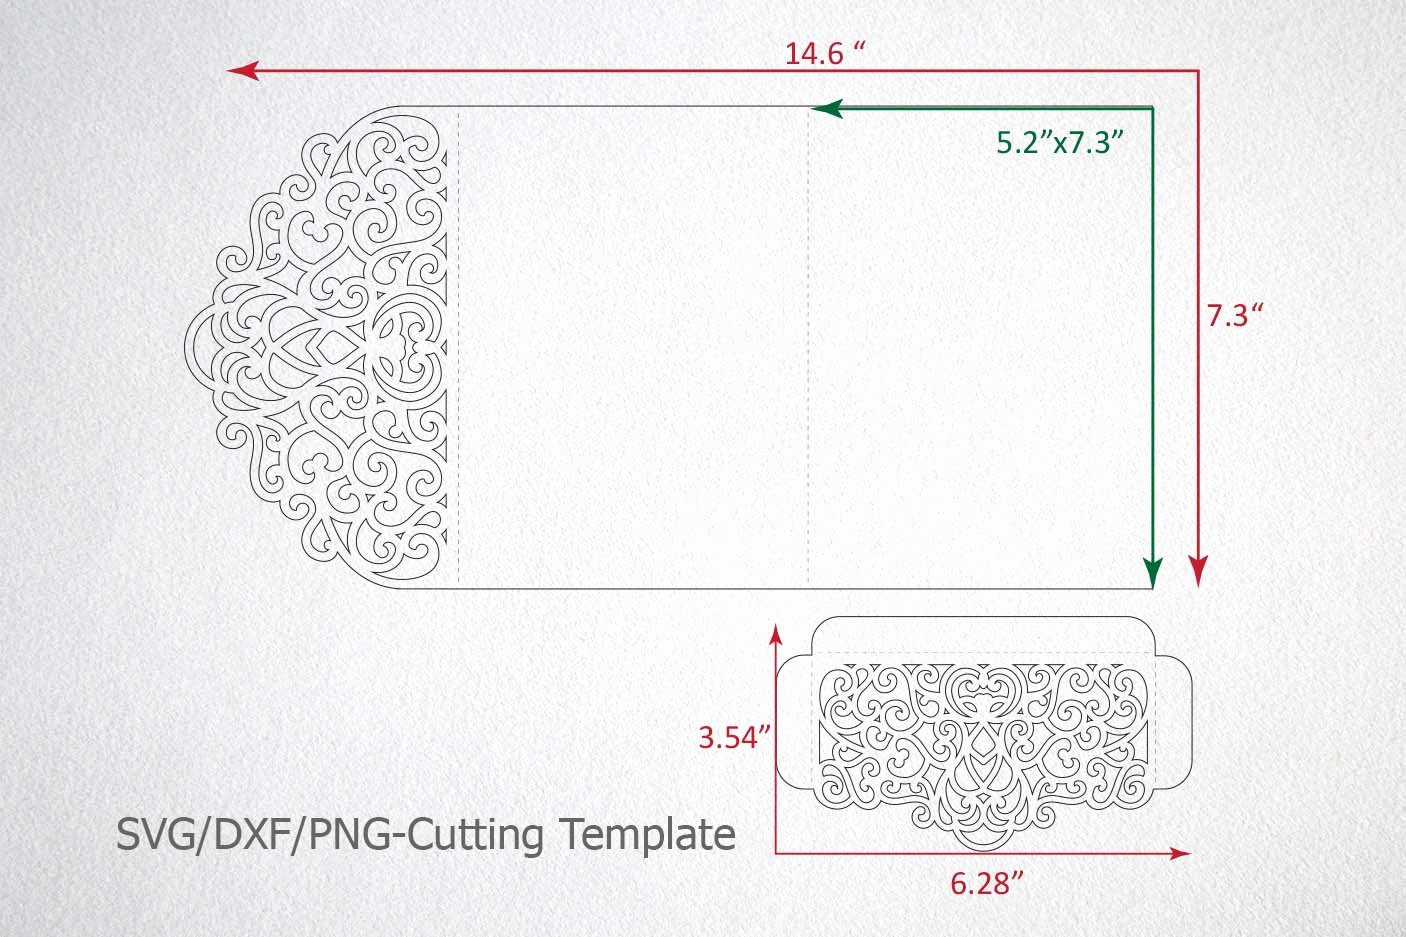 Pocket Envelope Template Beautiful Tri Fold Wedding Invitation Pocket Envelope Svg Dxf Template